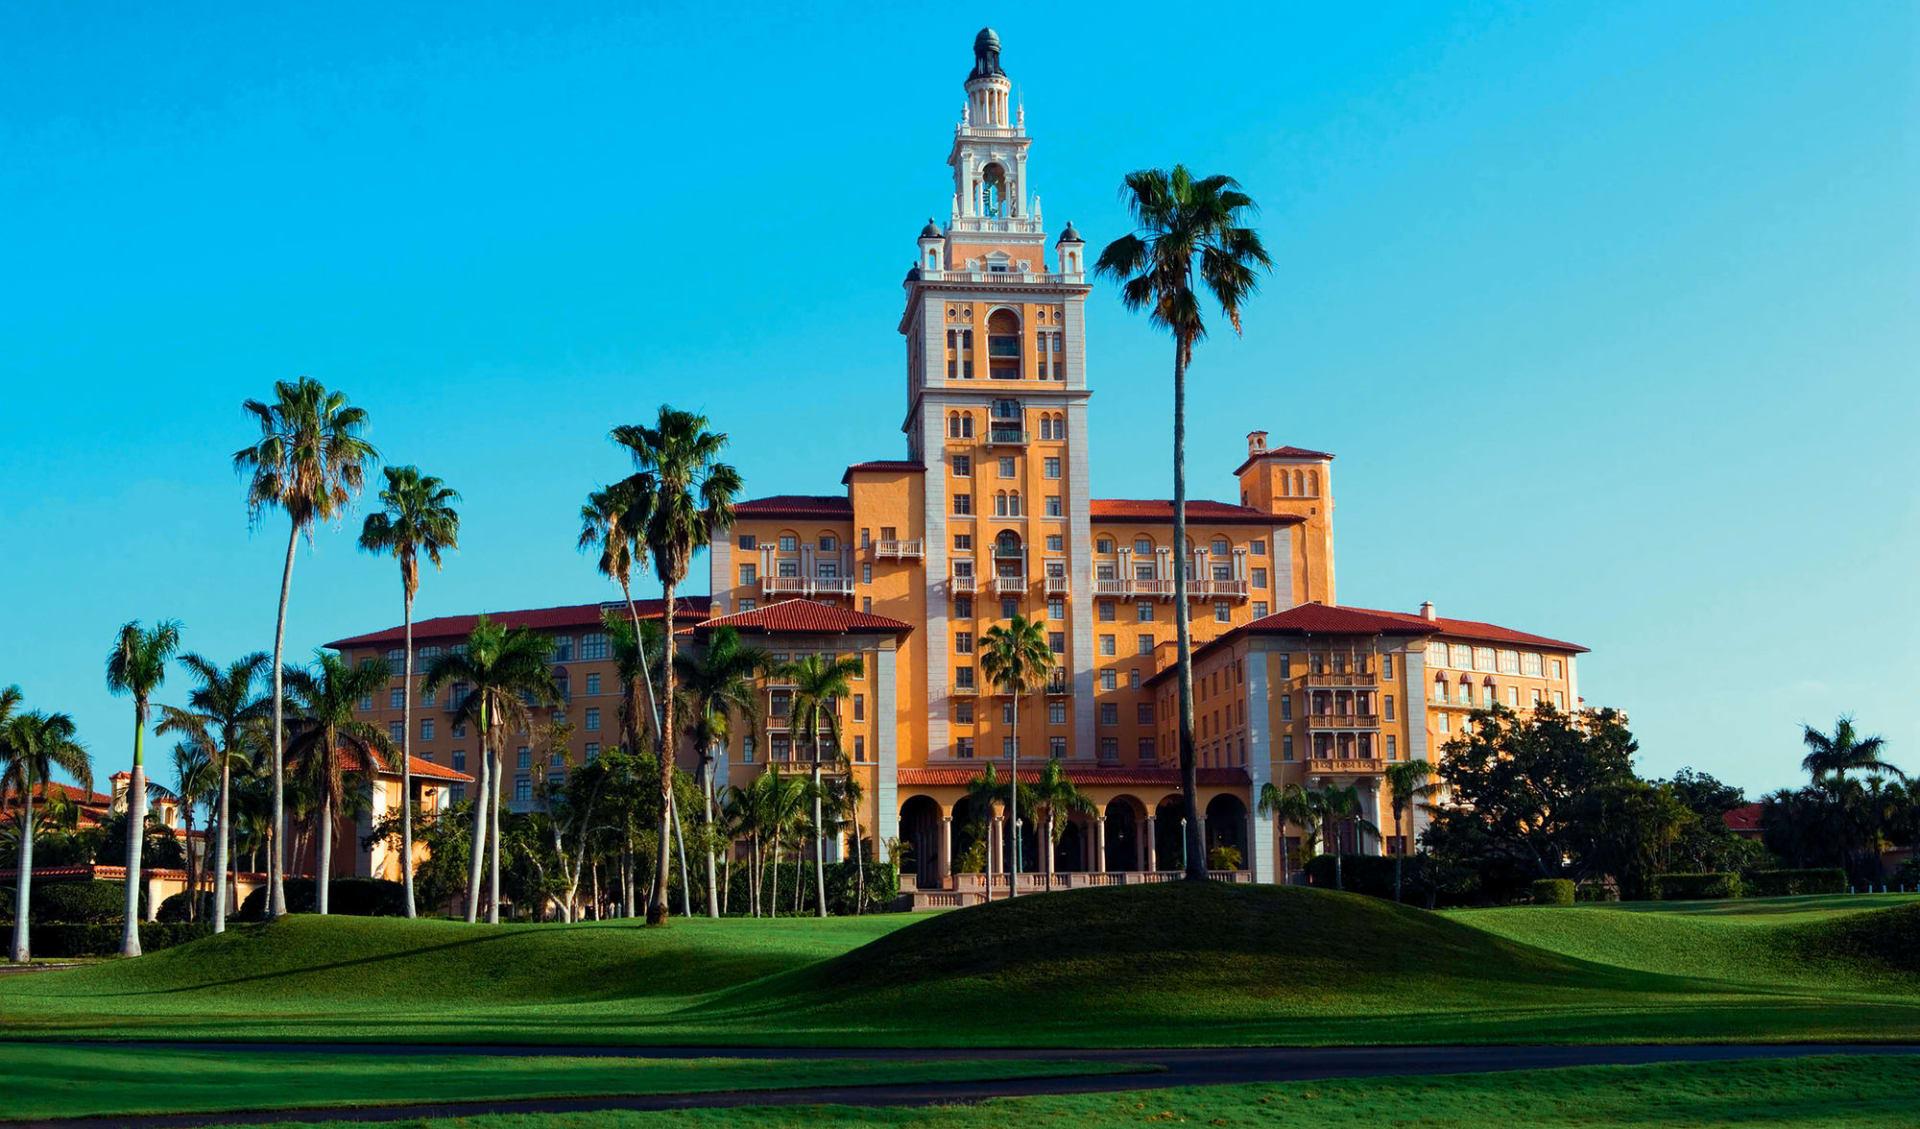 The Biltmore in Miami: The Biltmore - Aussenansicht